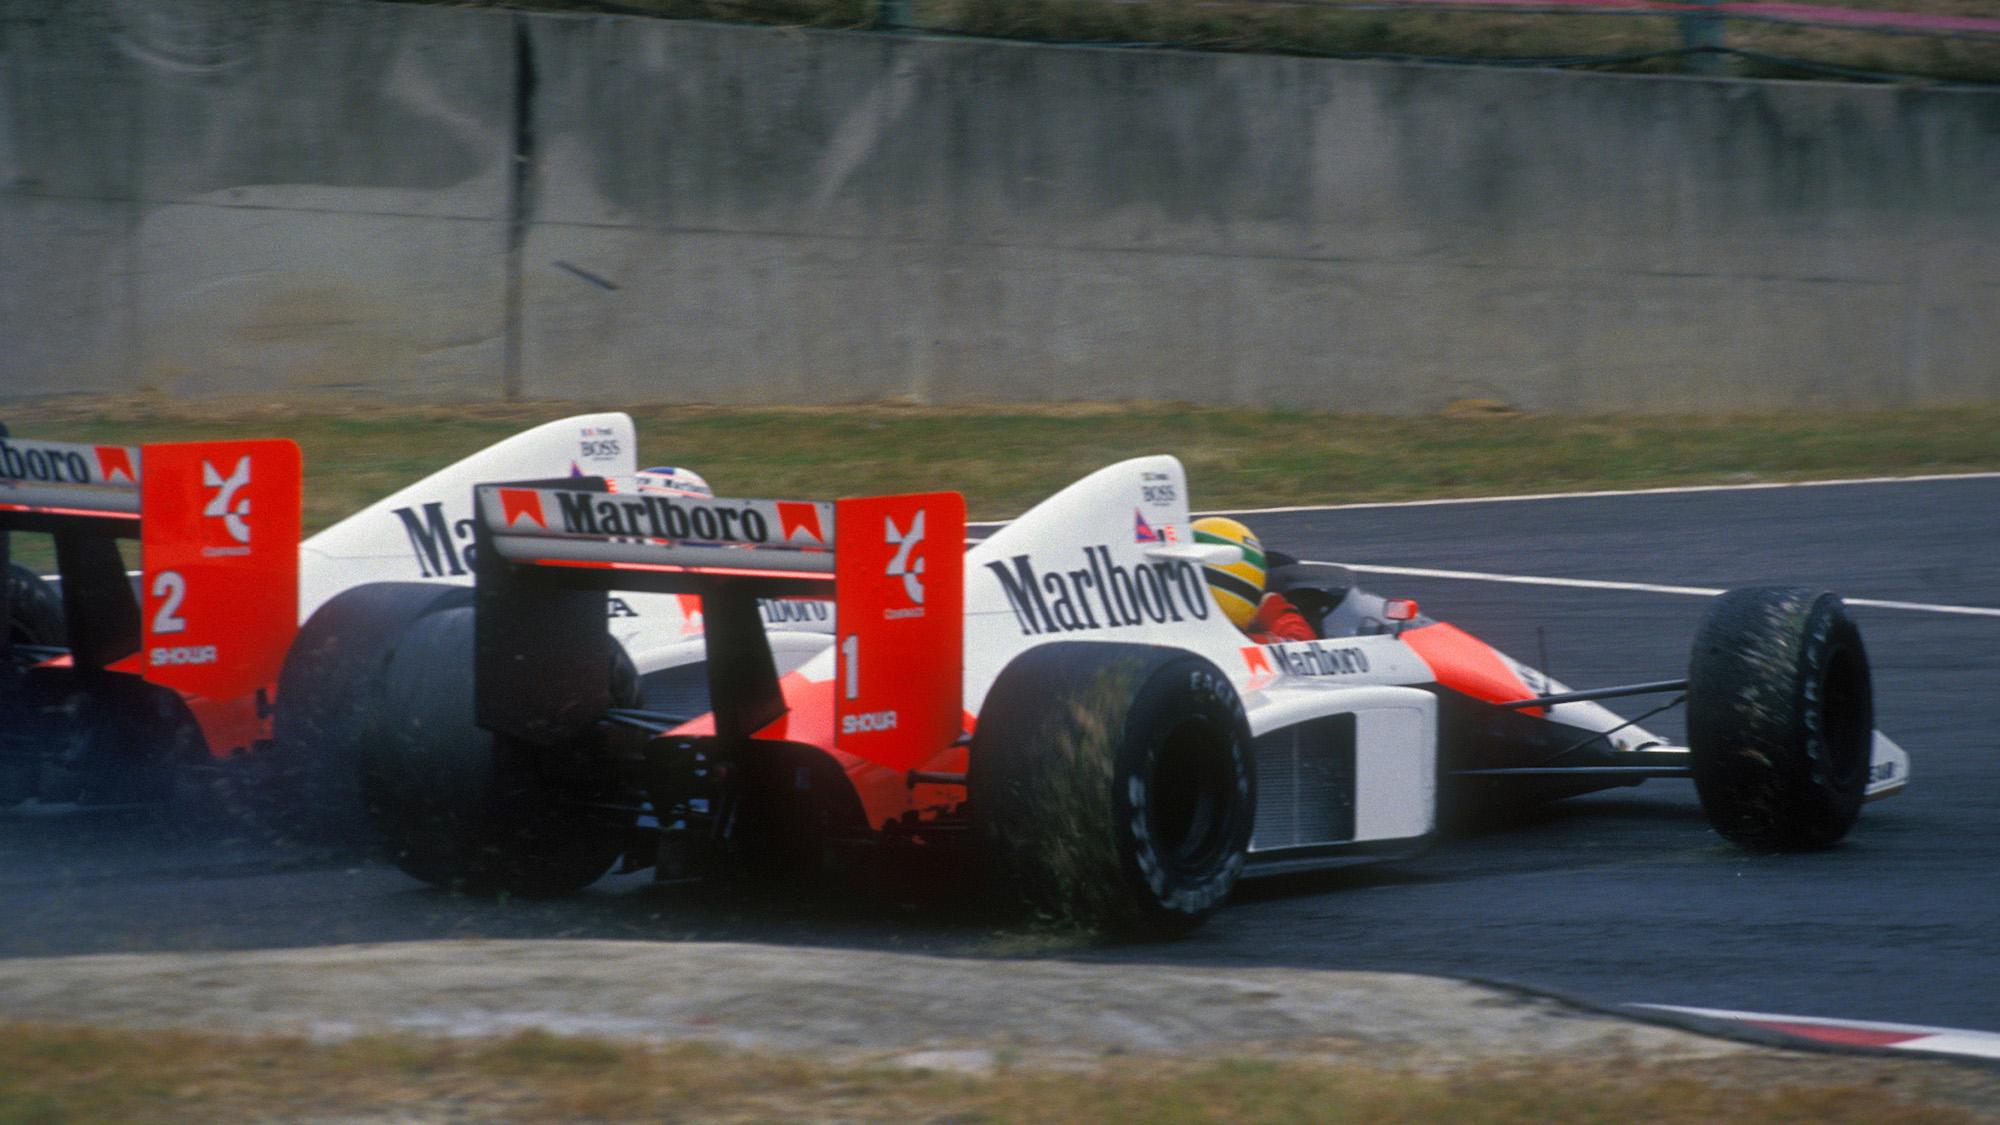 Ayrton Senna and Alain Prost crash at the 1989 Japanese Grand Prix